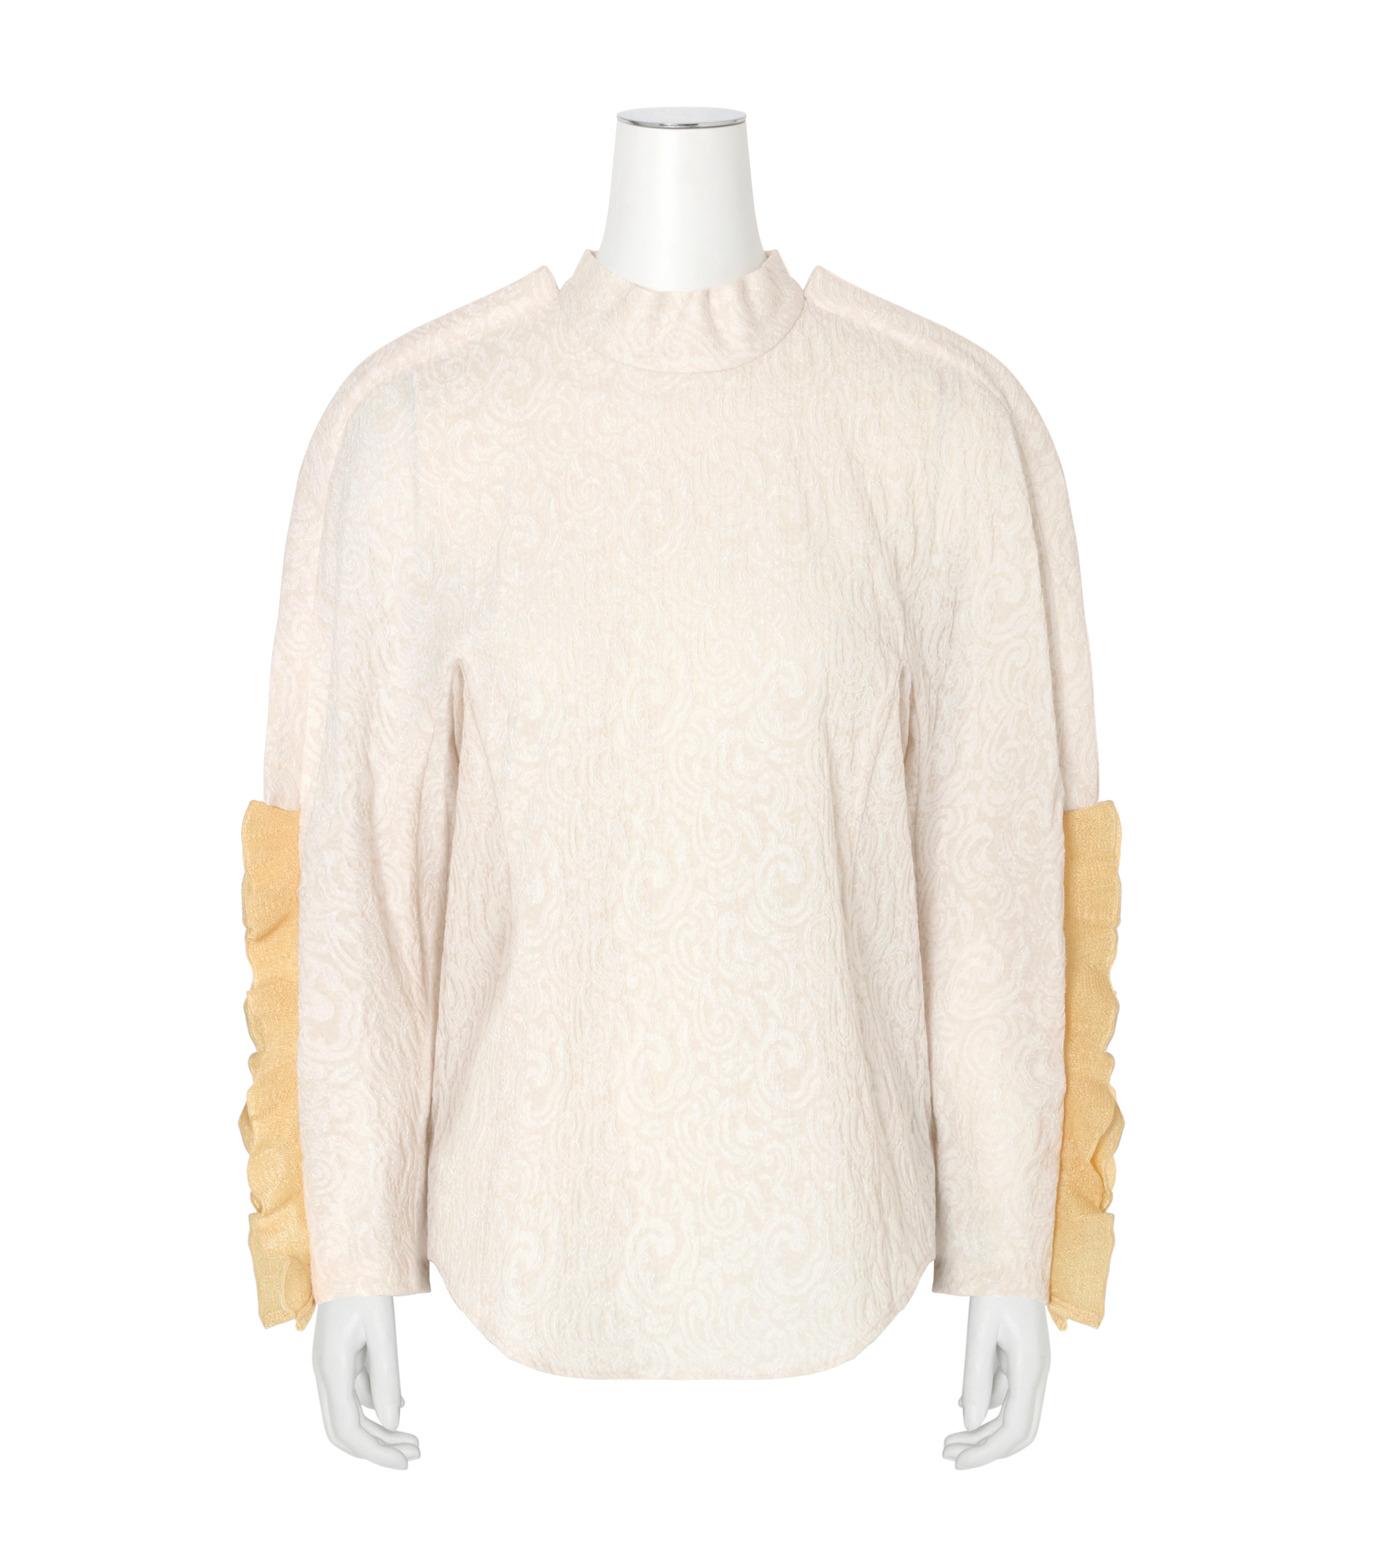 Toga(トーガ)のLace Jacqaurd Shirt-WHITE(BLOUSE/BLOUSE)-TA62-F040-5 拡大詳細画像1